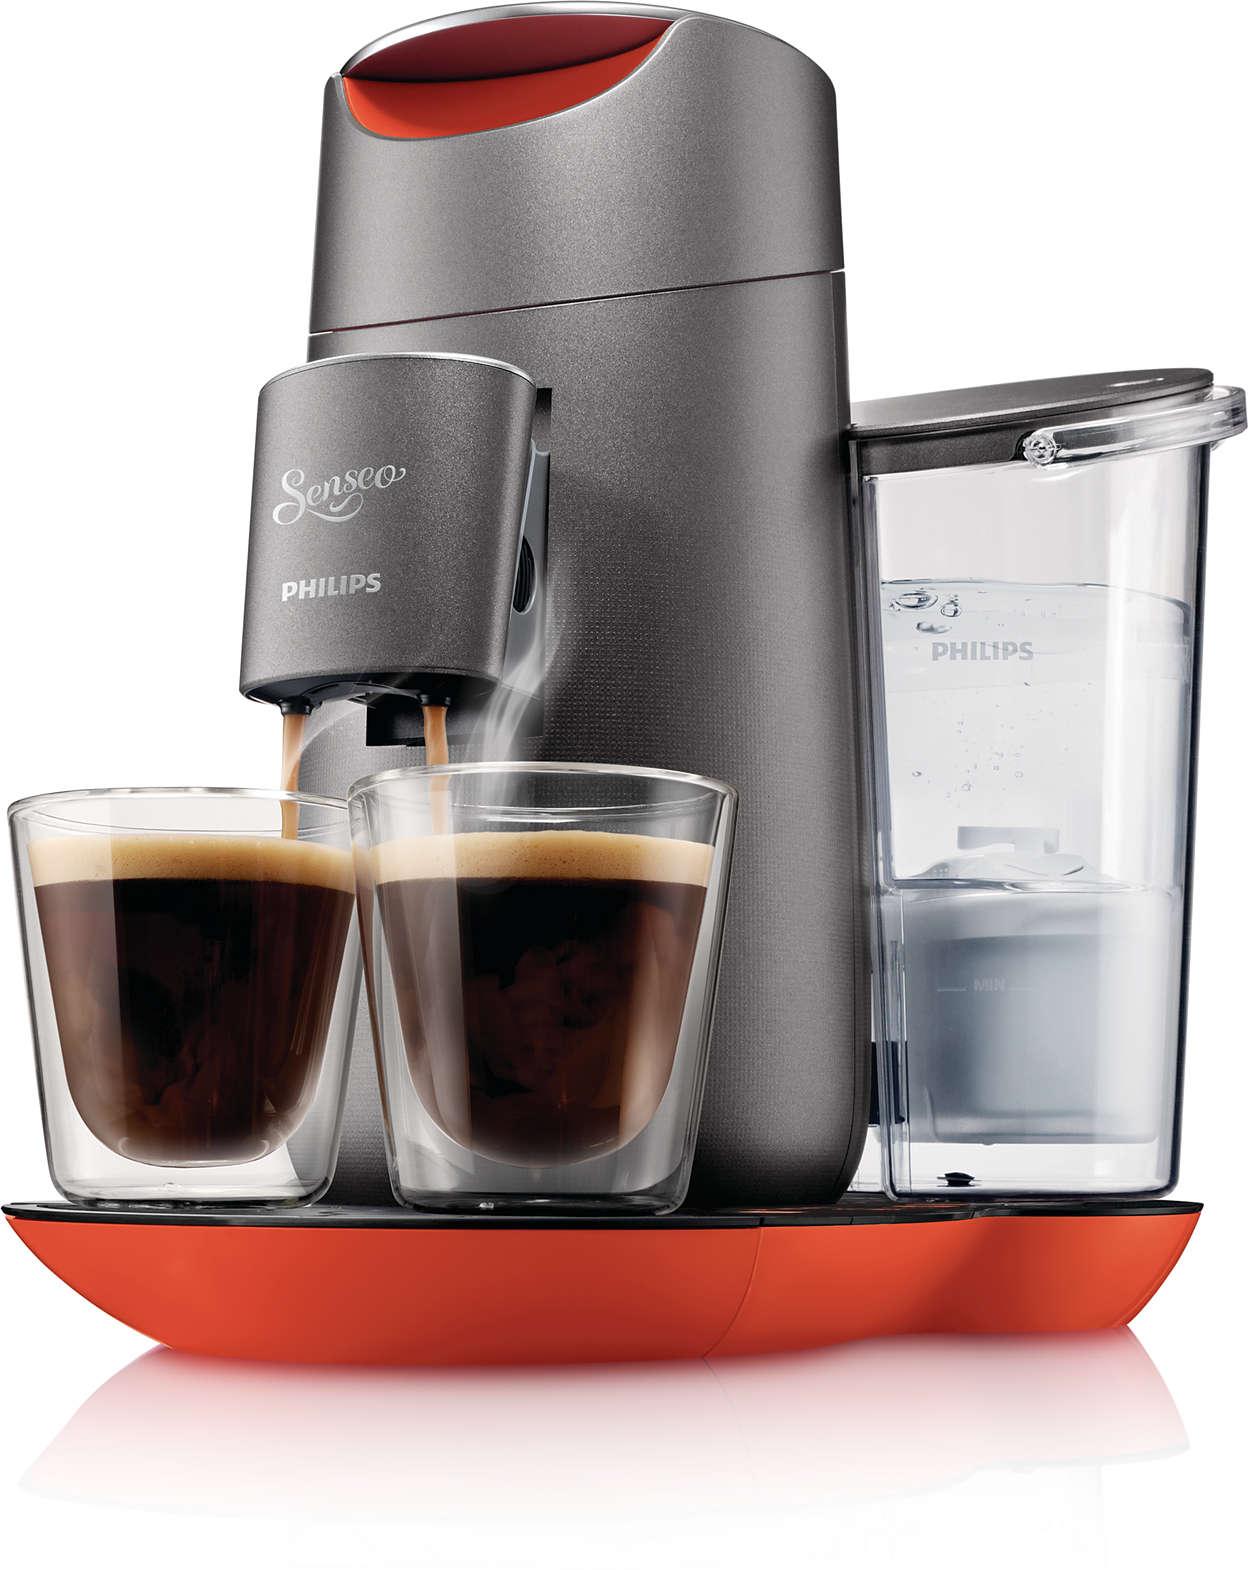 twist machine caf dosettes hd7873 51 senseo. Black Bedroom Furniture Sets. Home Design Ideas